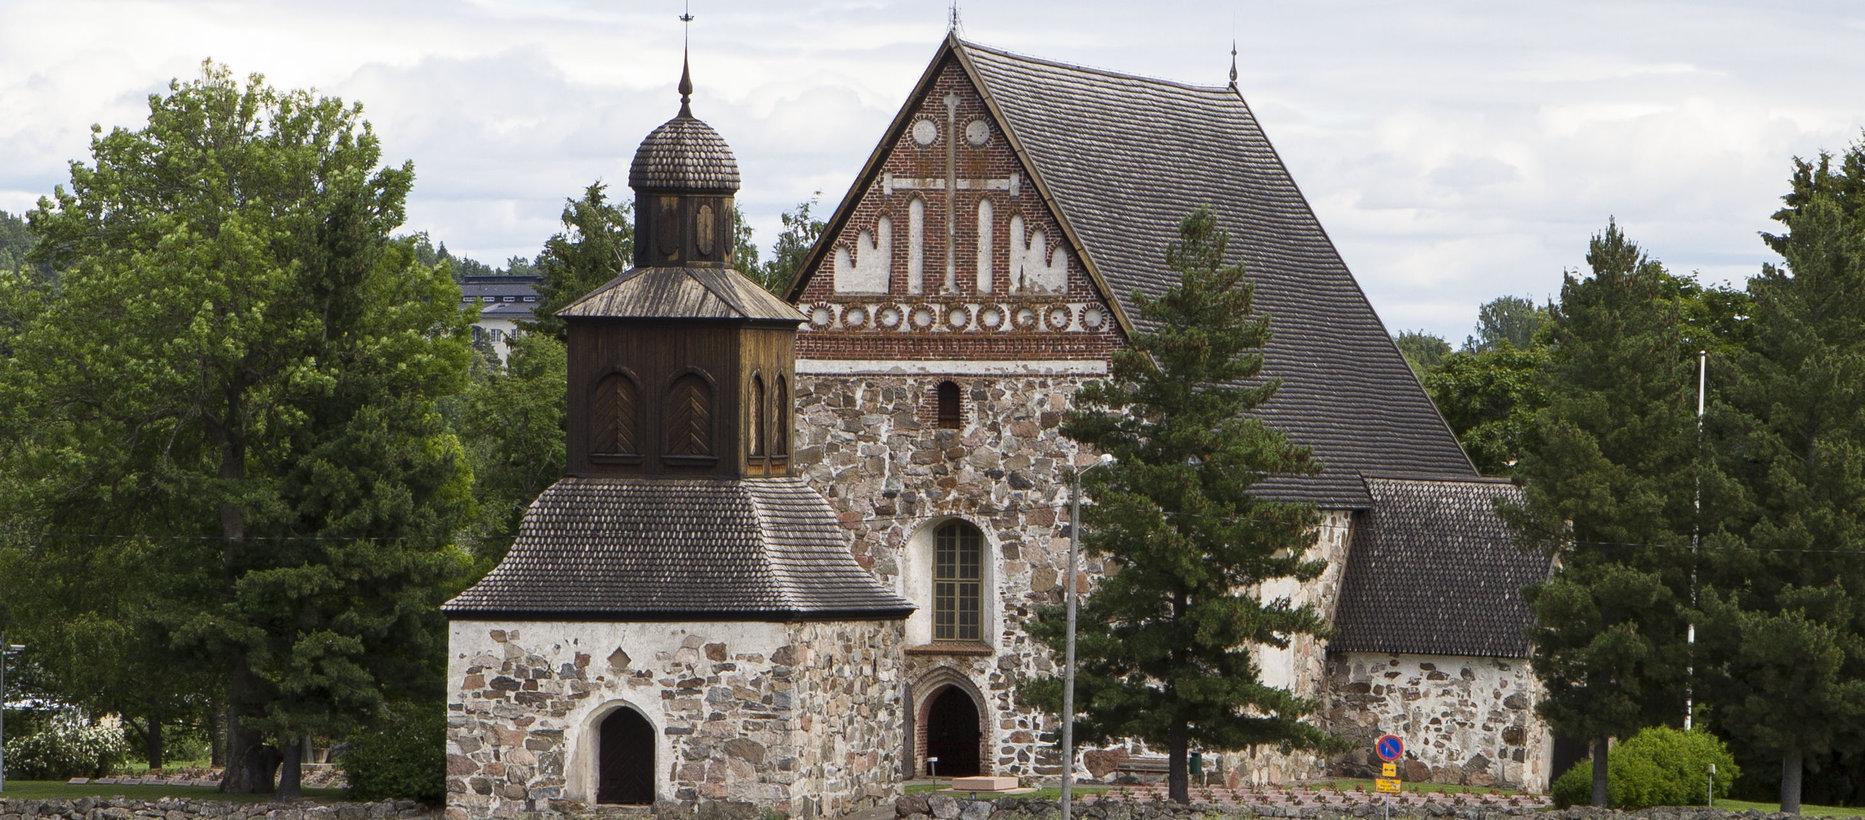 Sibbo gamla kyrka S:t Sigfrid